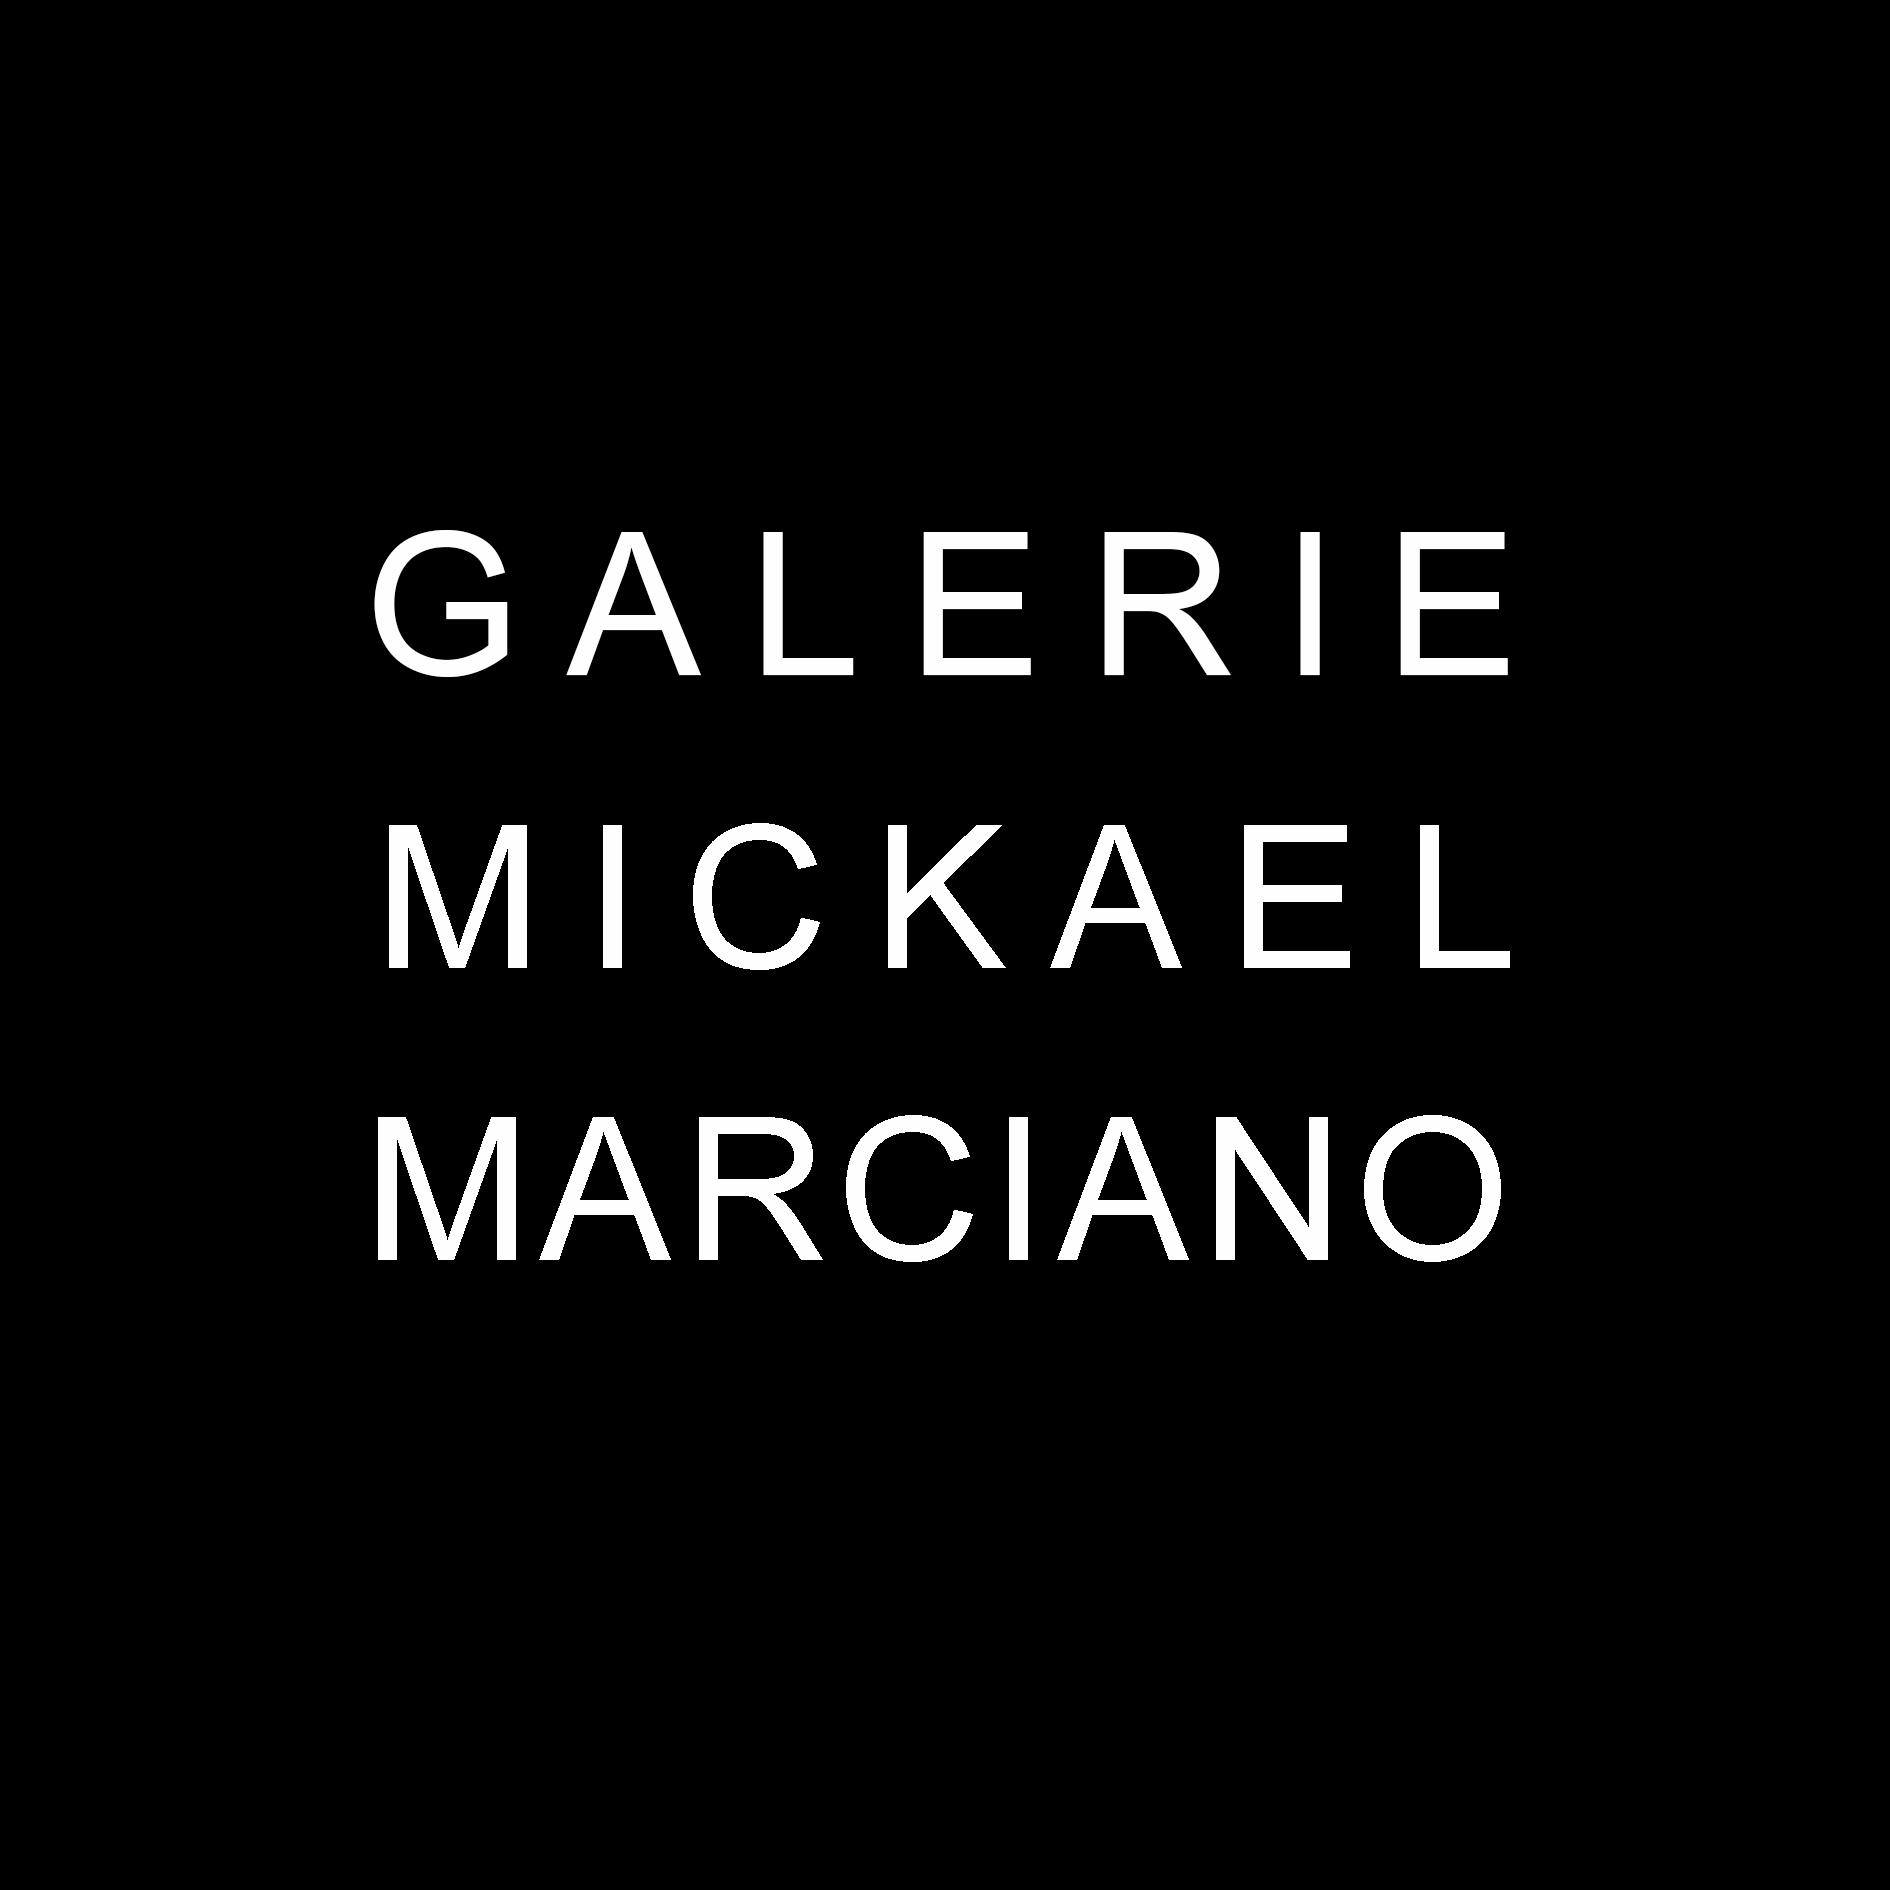 Galerie Mickael Marciano